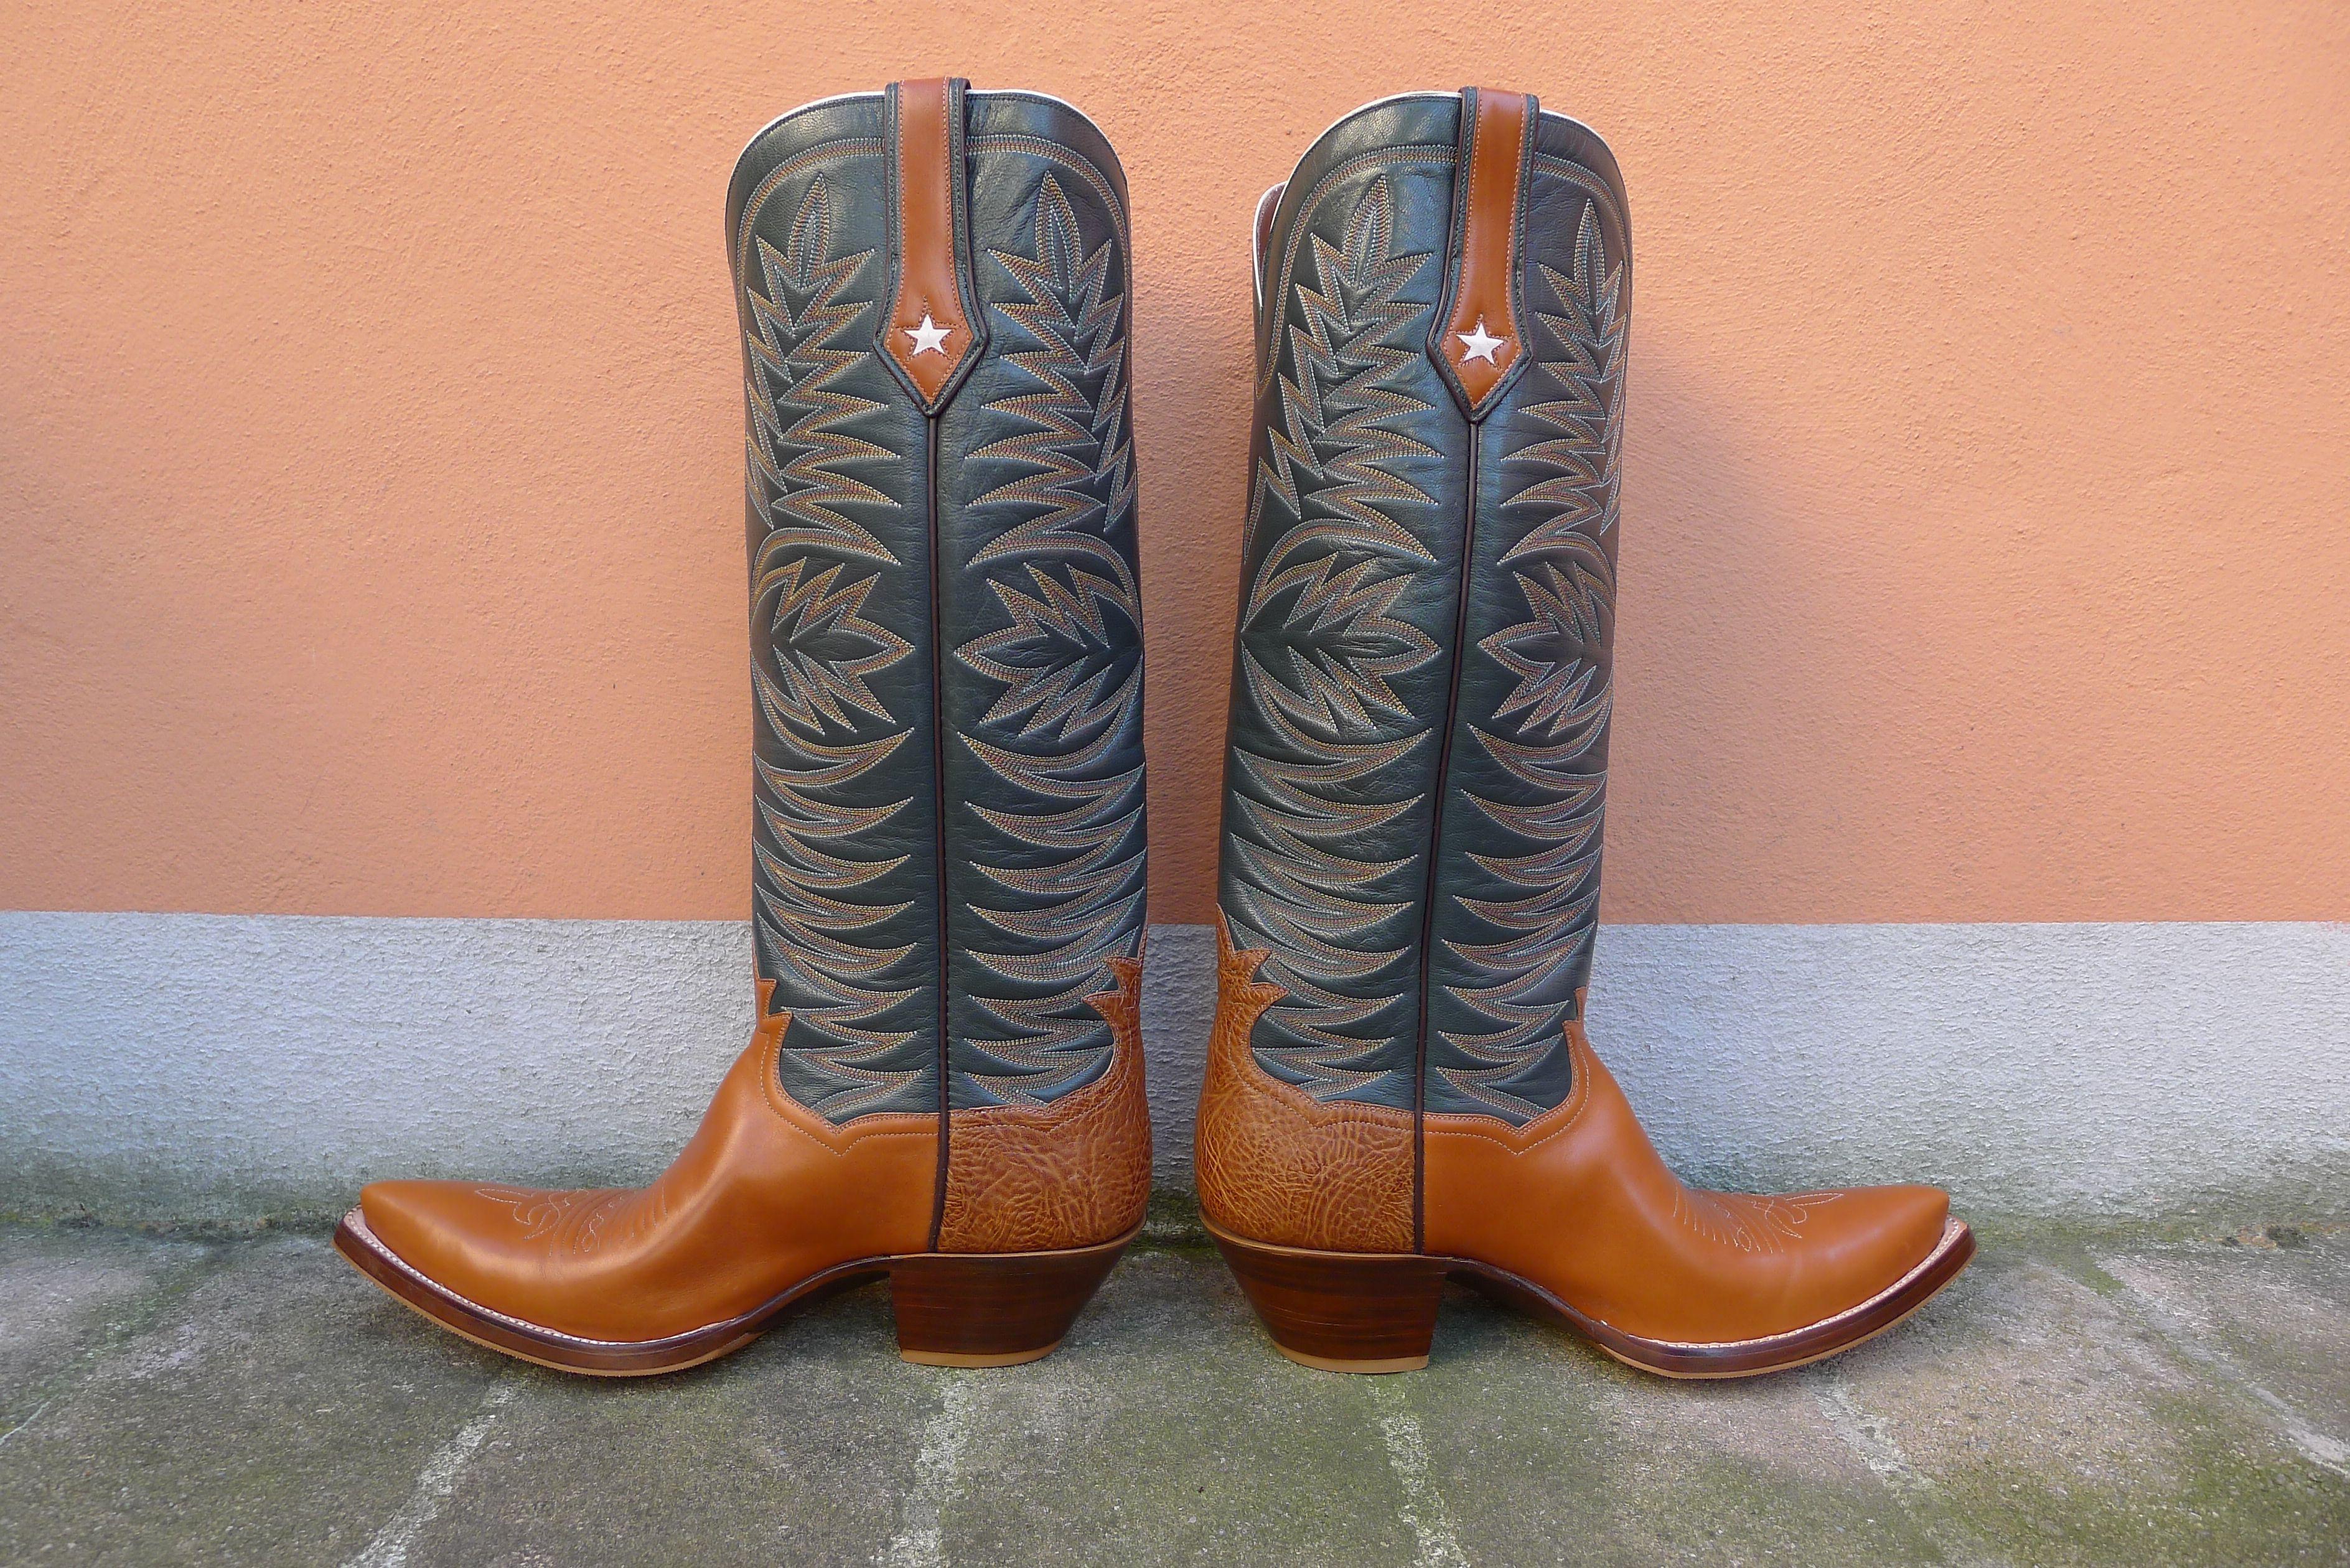 ee64623dc73 Custom Cowboy Boots, handmade by Legendary Boot Co., El Paso Texas ...